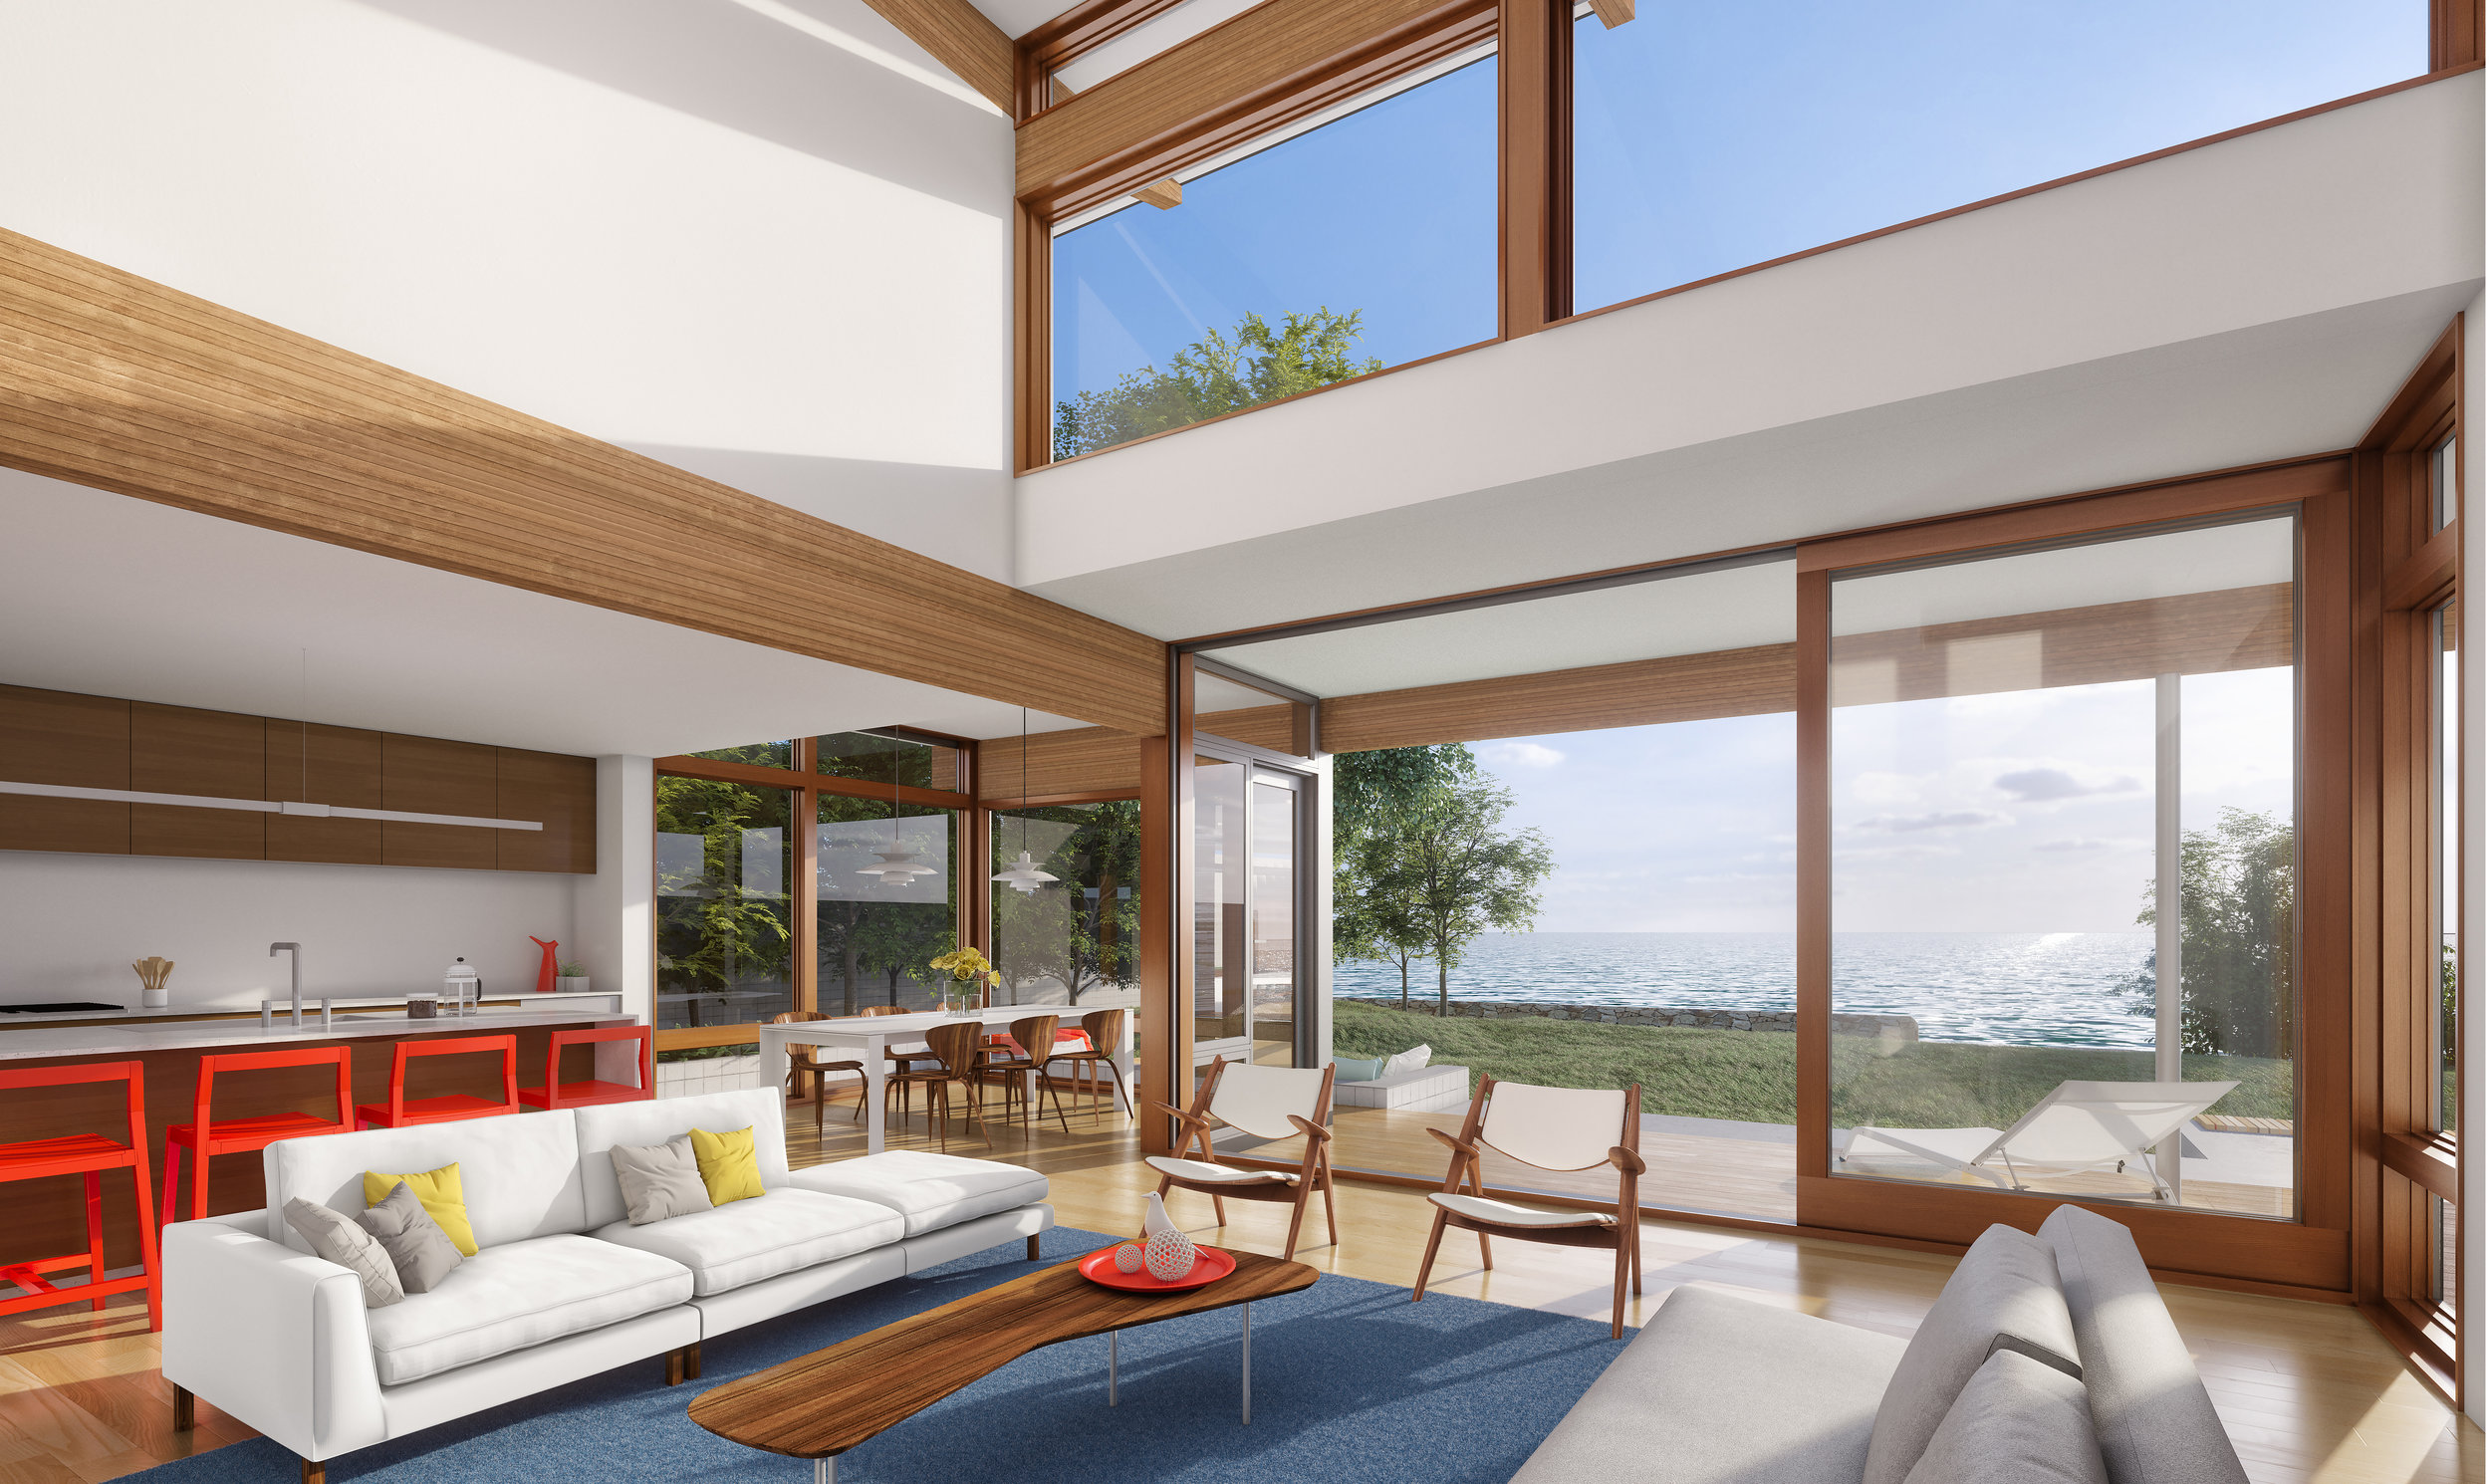 turkel_design_modern_prefab_home_axiom_series_rendering_axiom1850_interior.jpg